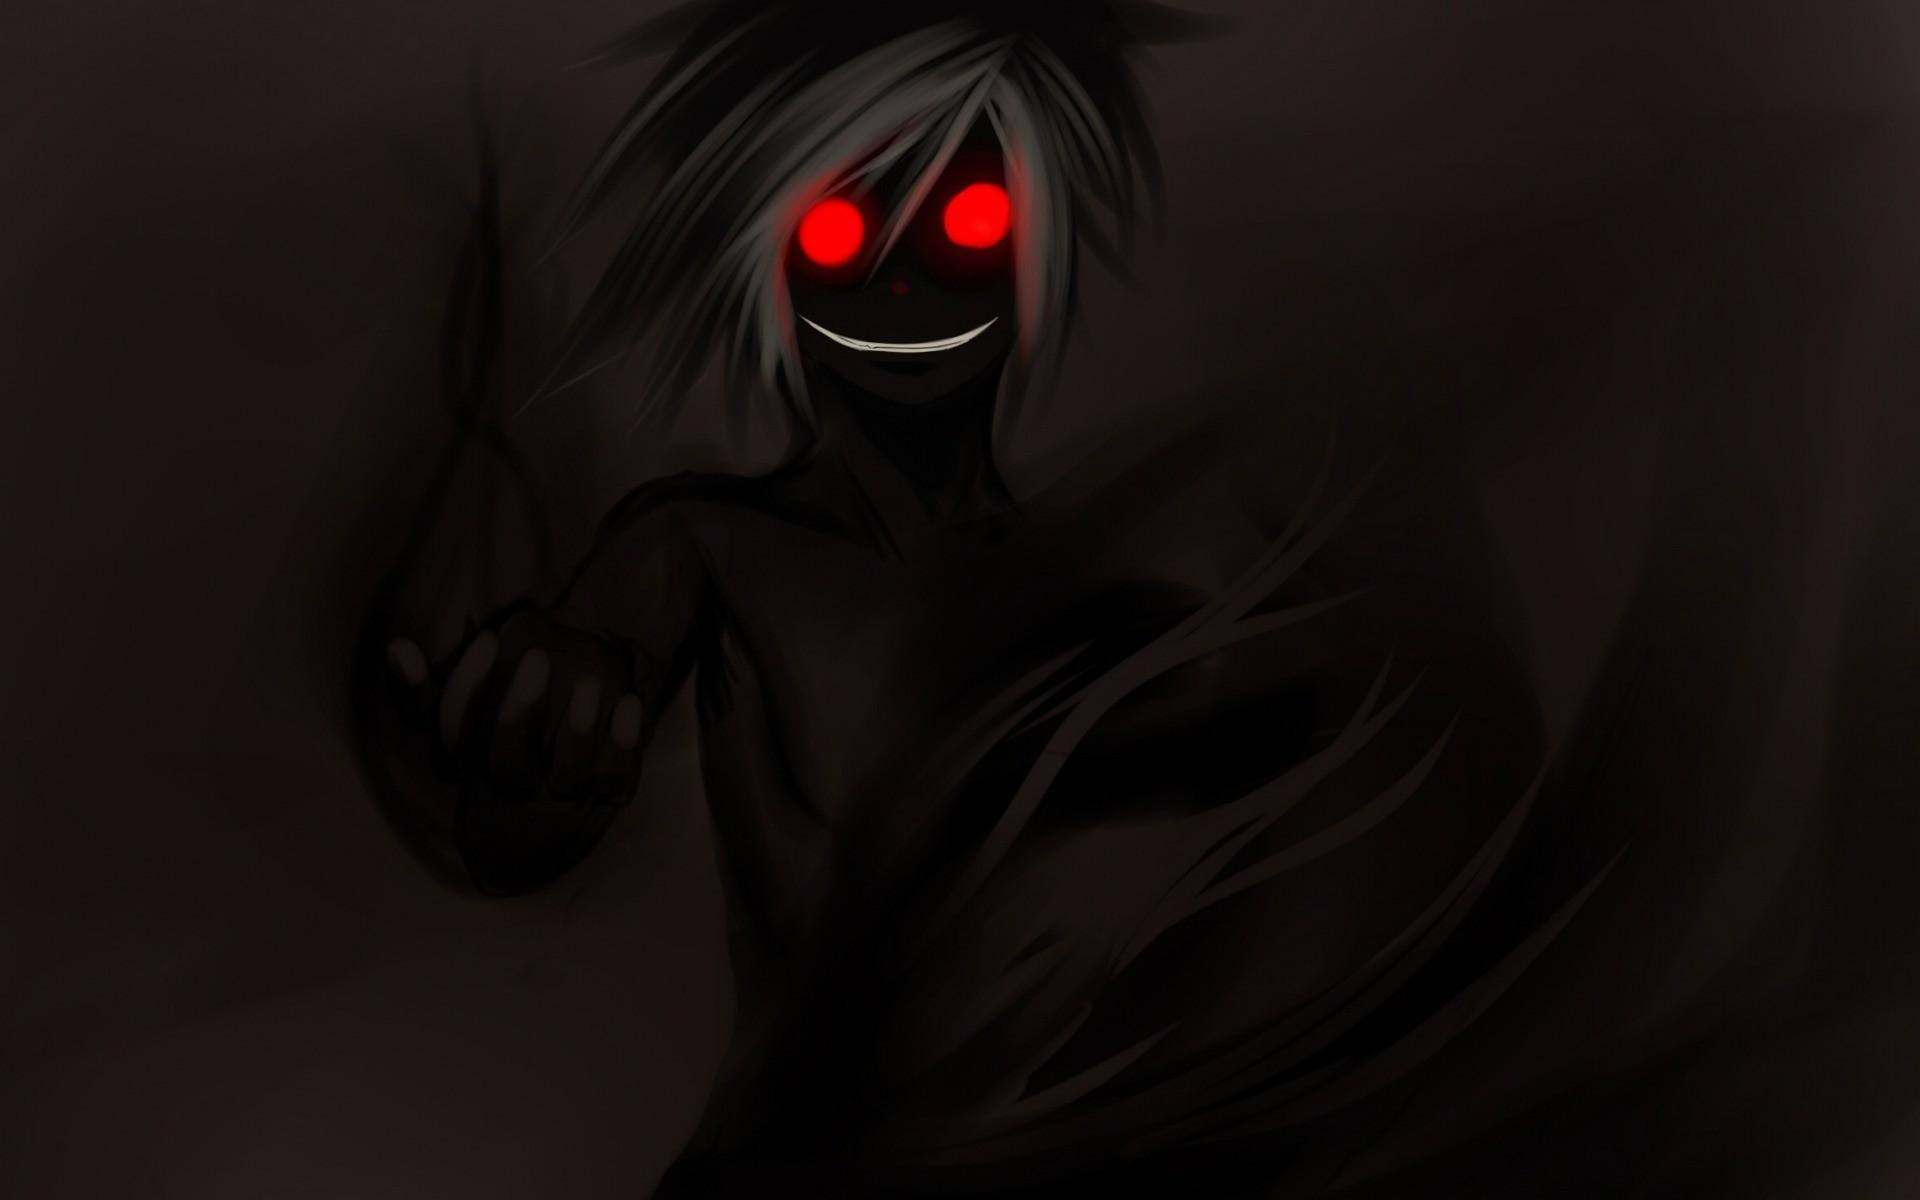 Hintergrundbilder : schwarz, einfarbig, Anime, Manga, Dämon ...